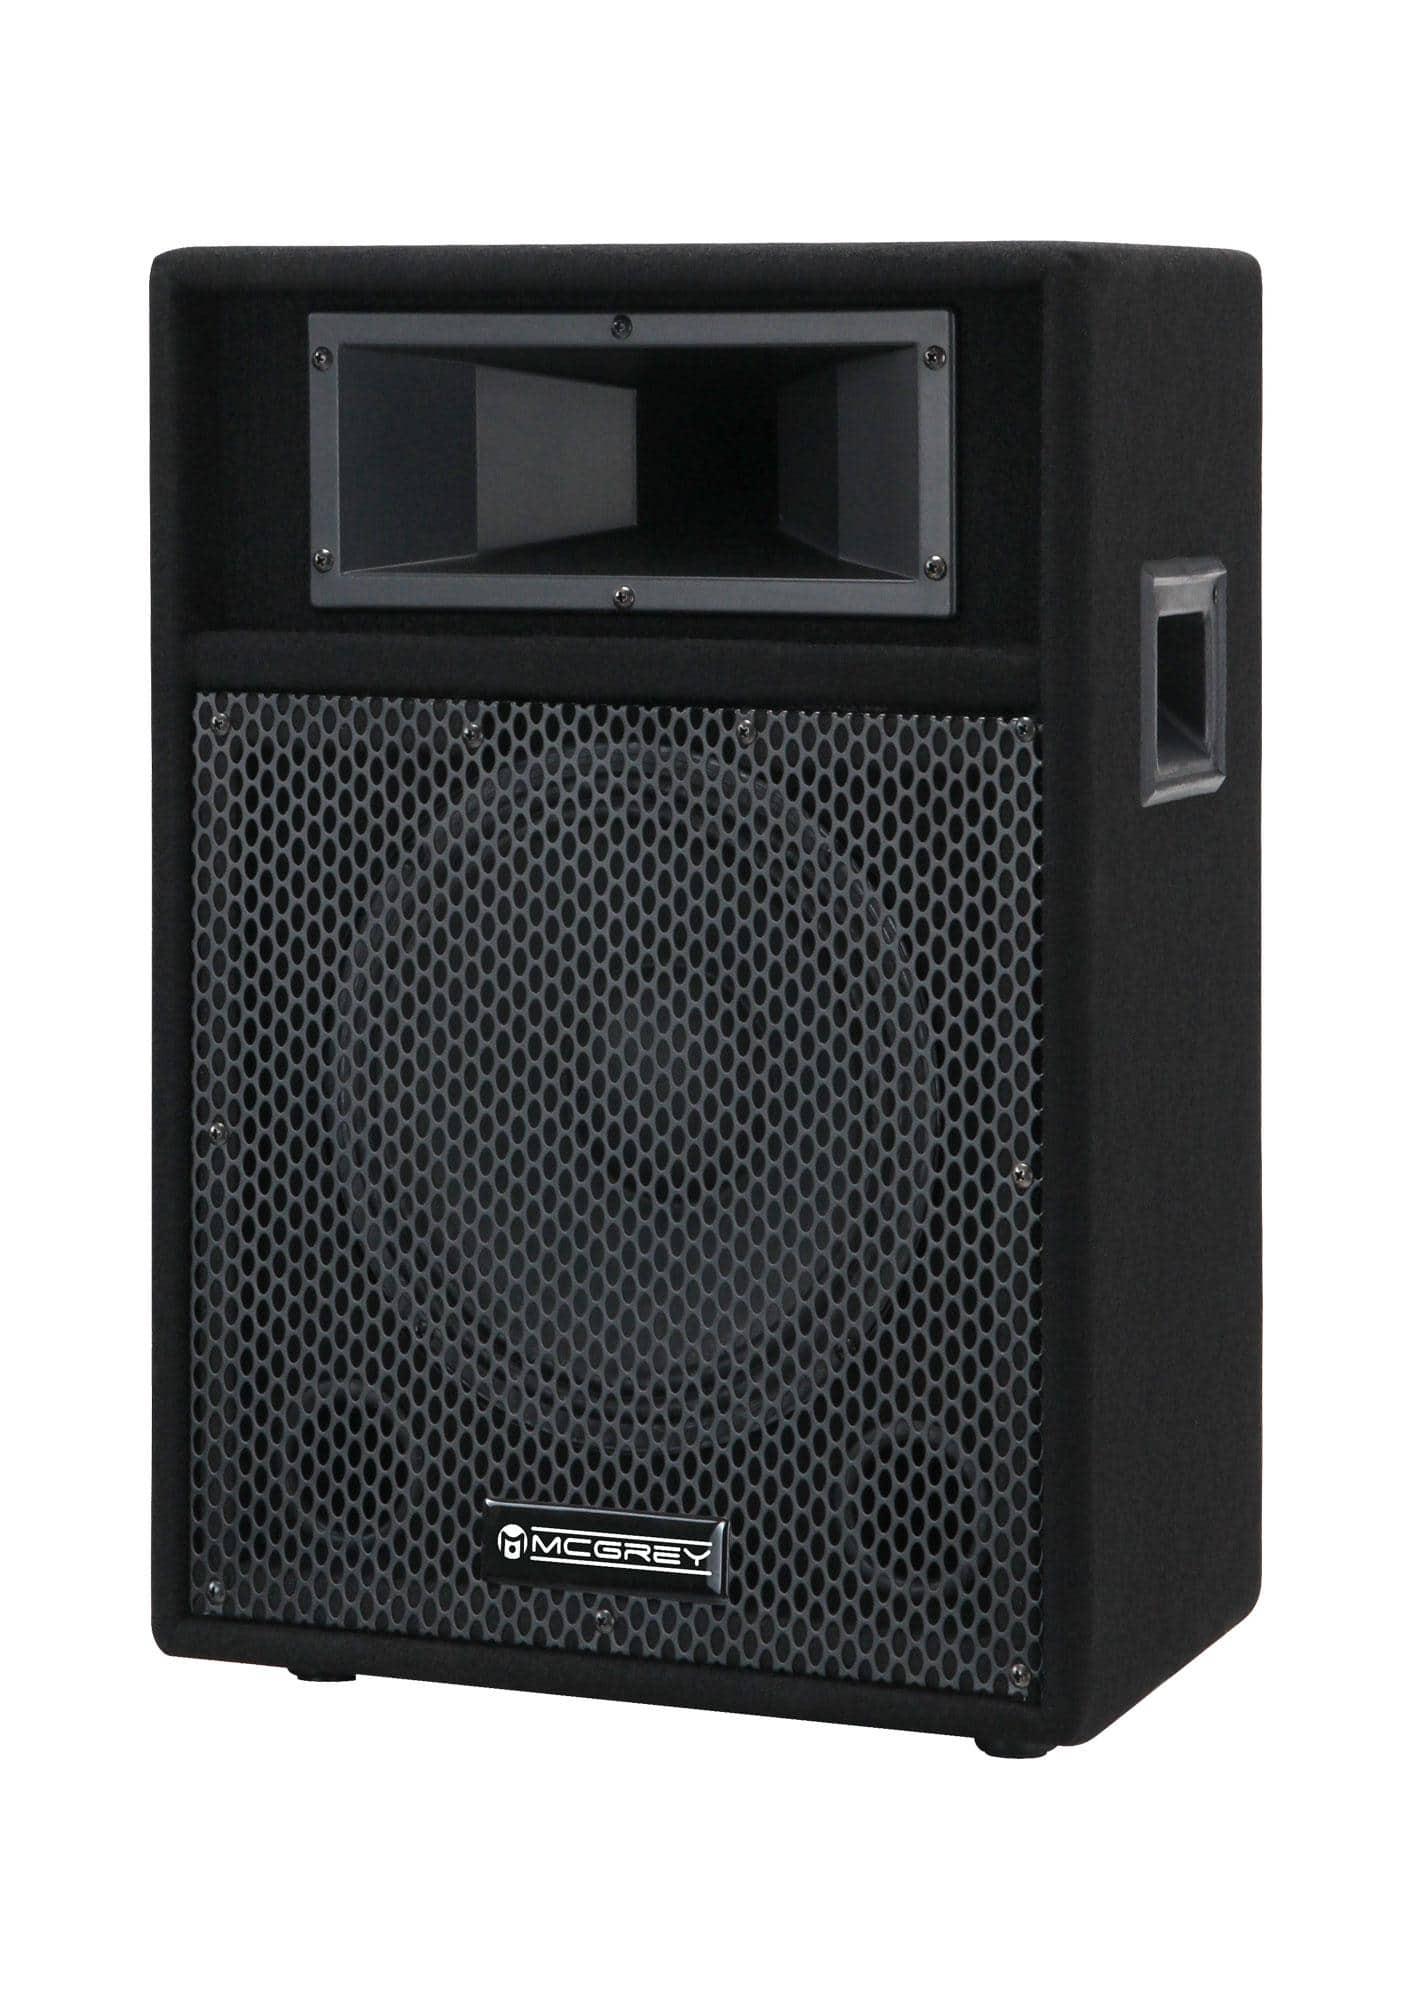 Paboxen - McGrey PA 110 passive PA Lautsprecher Box 200 Watt - Onlineshop Musikhaus Kirstein